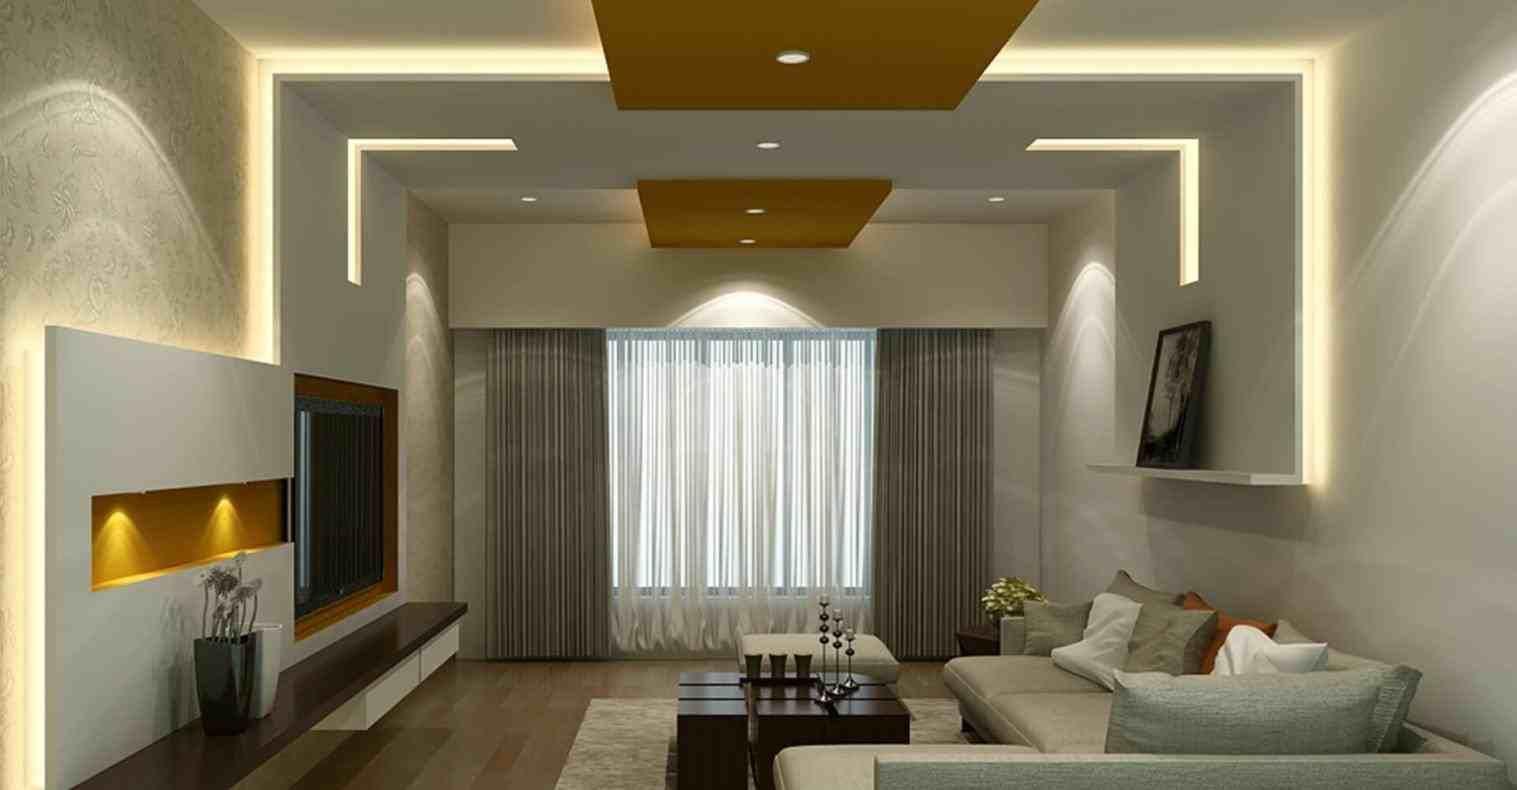 16 Magnetic Bedroom False Ceiling Light Fixtures I